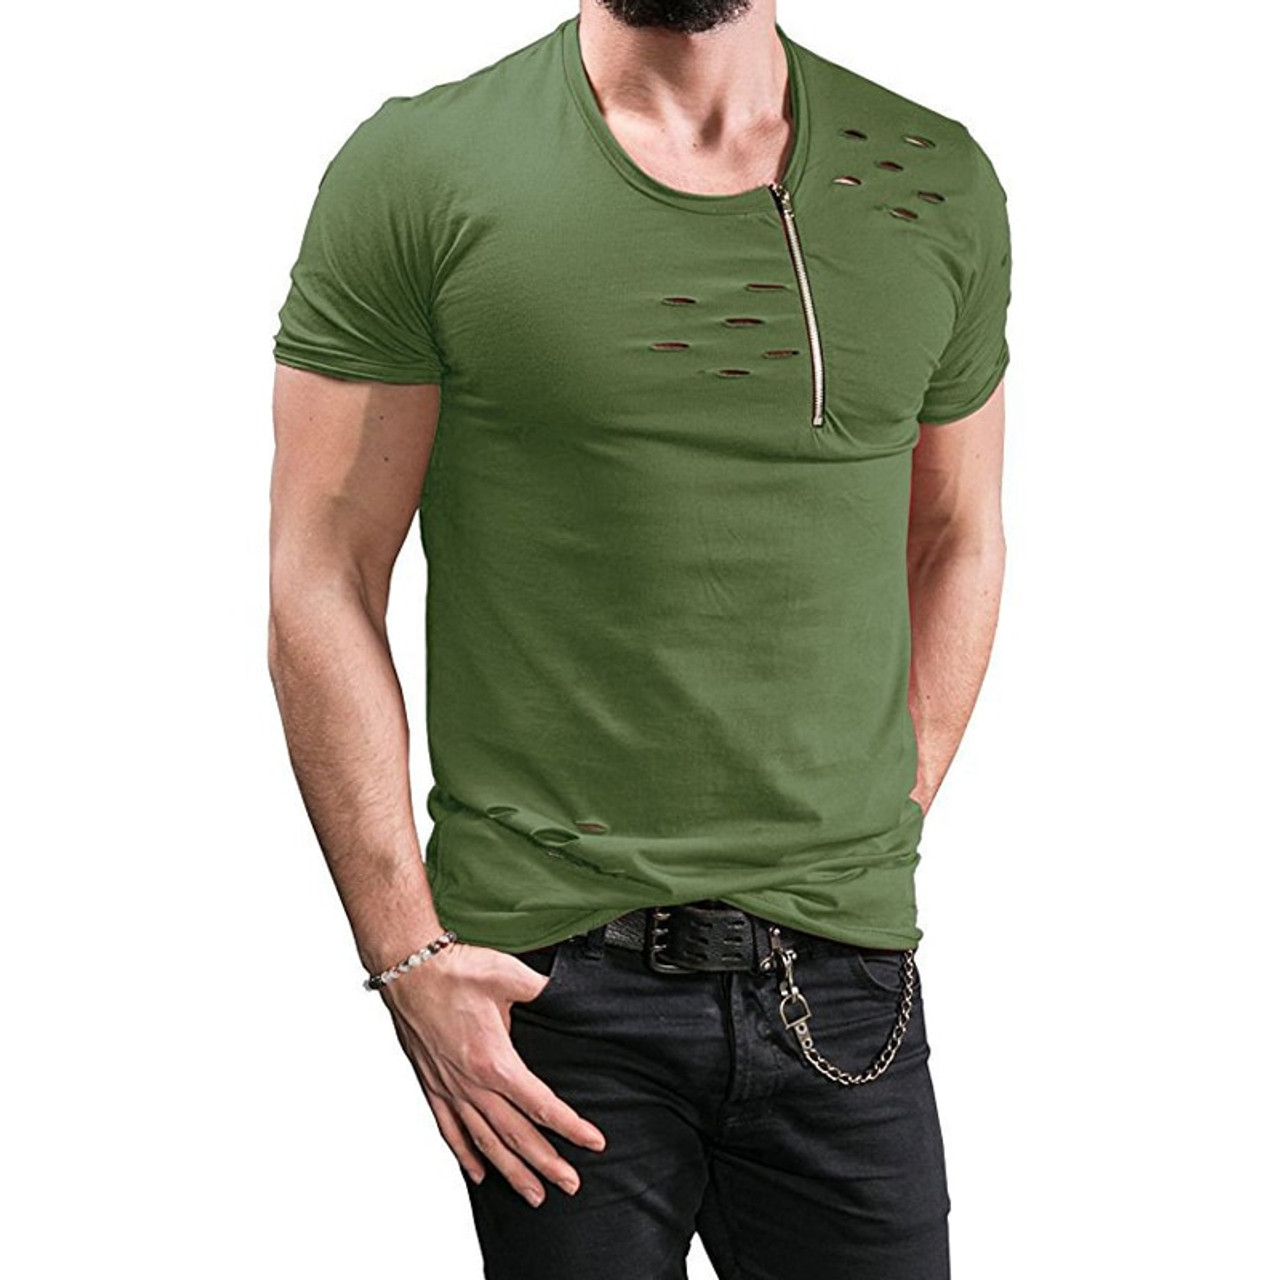 cd22b6482 ... Uwback 2018 New Summer T Shirt Men Plus Size 3XL Ripped Hole T-shirts  Men ...